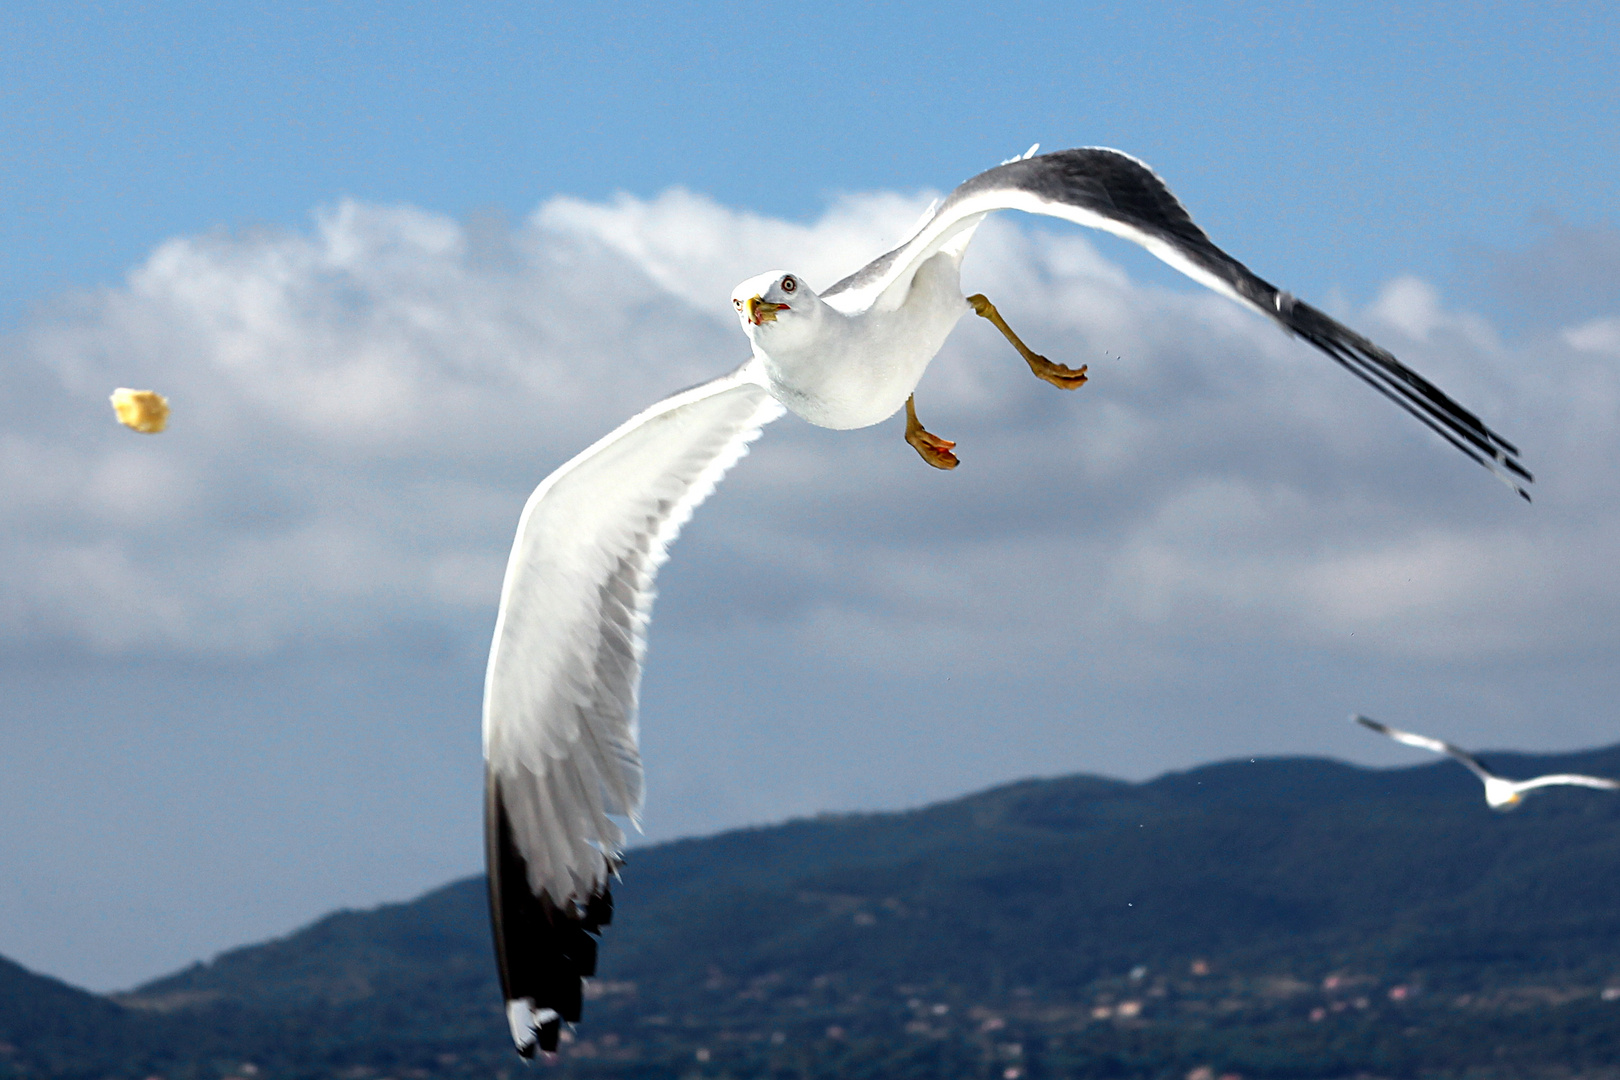 flight maneuvers